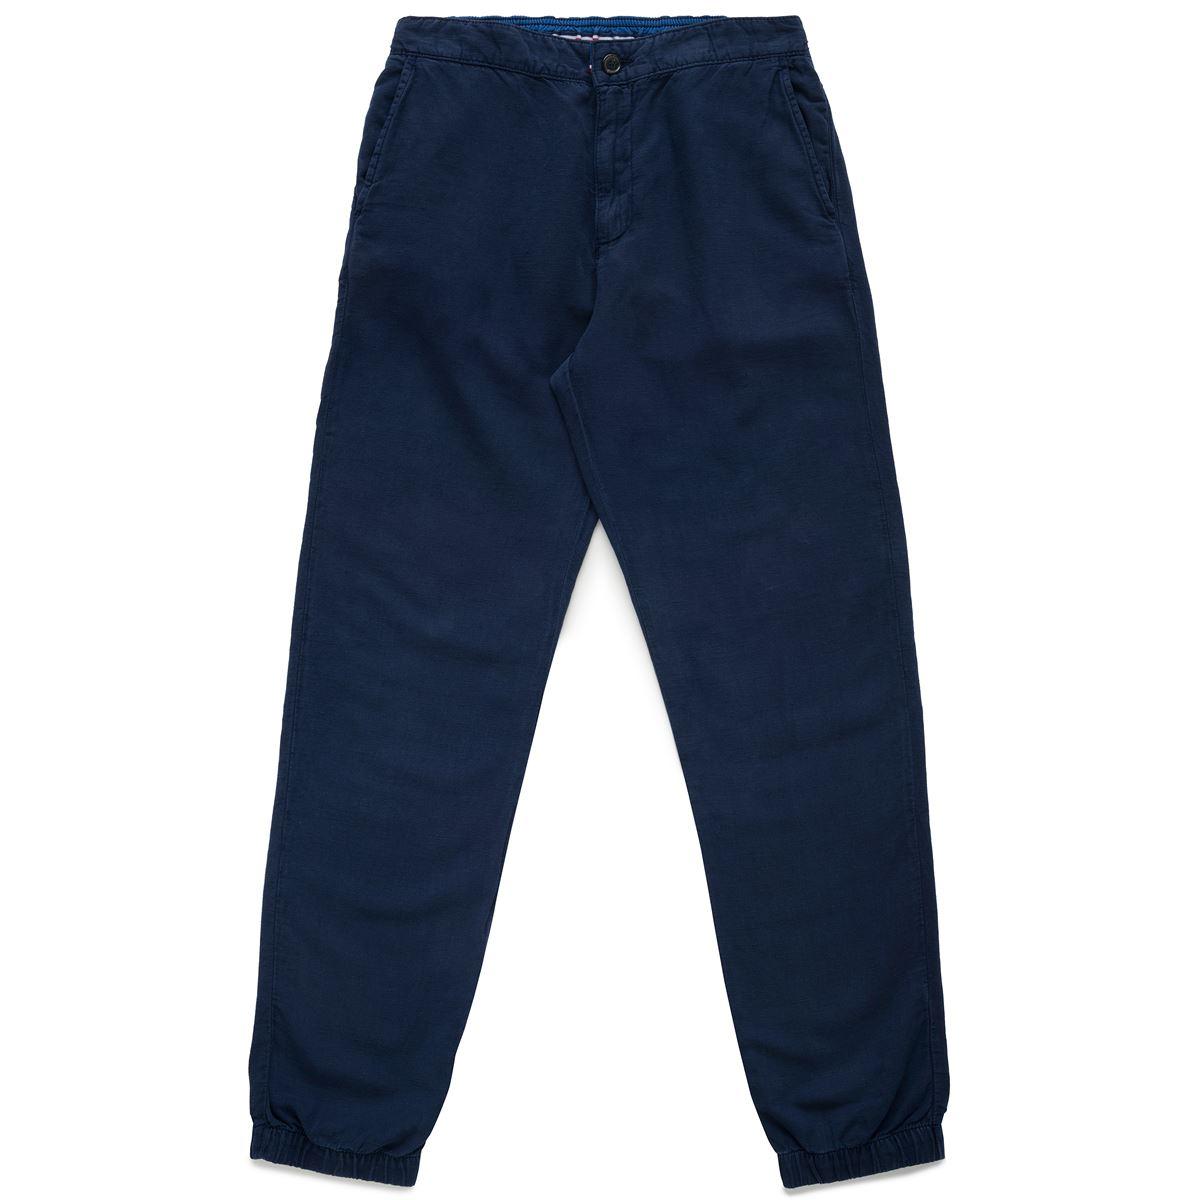 Robe di Kappa Pantaloni uomo-661163WASM